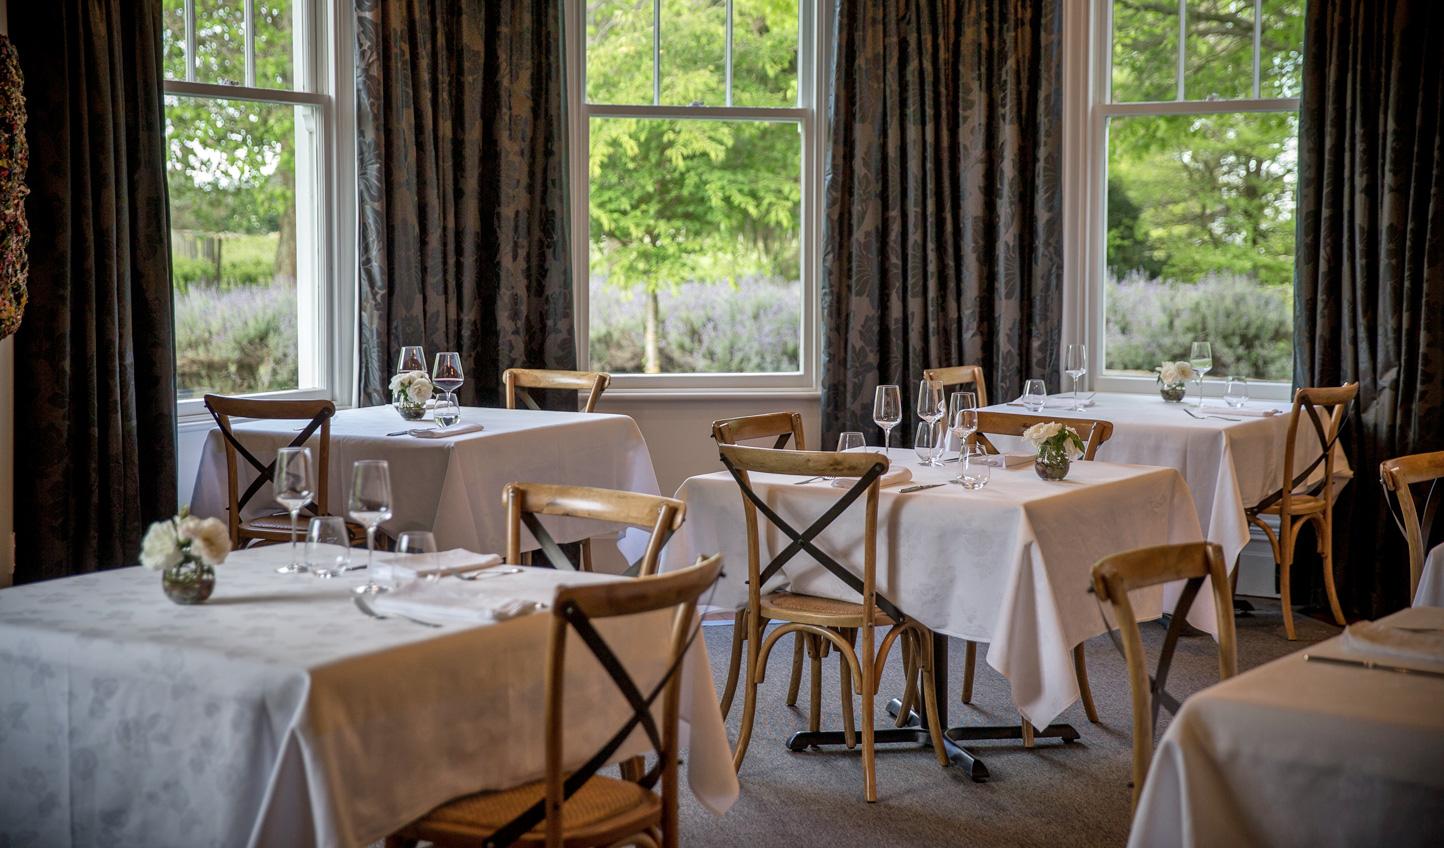 Sample the region's famous wines alongside dinner that evening